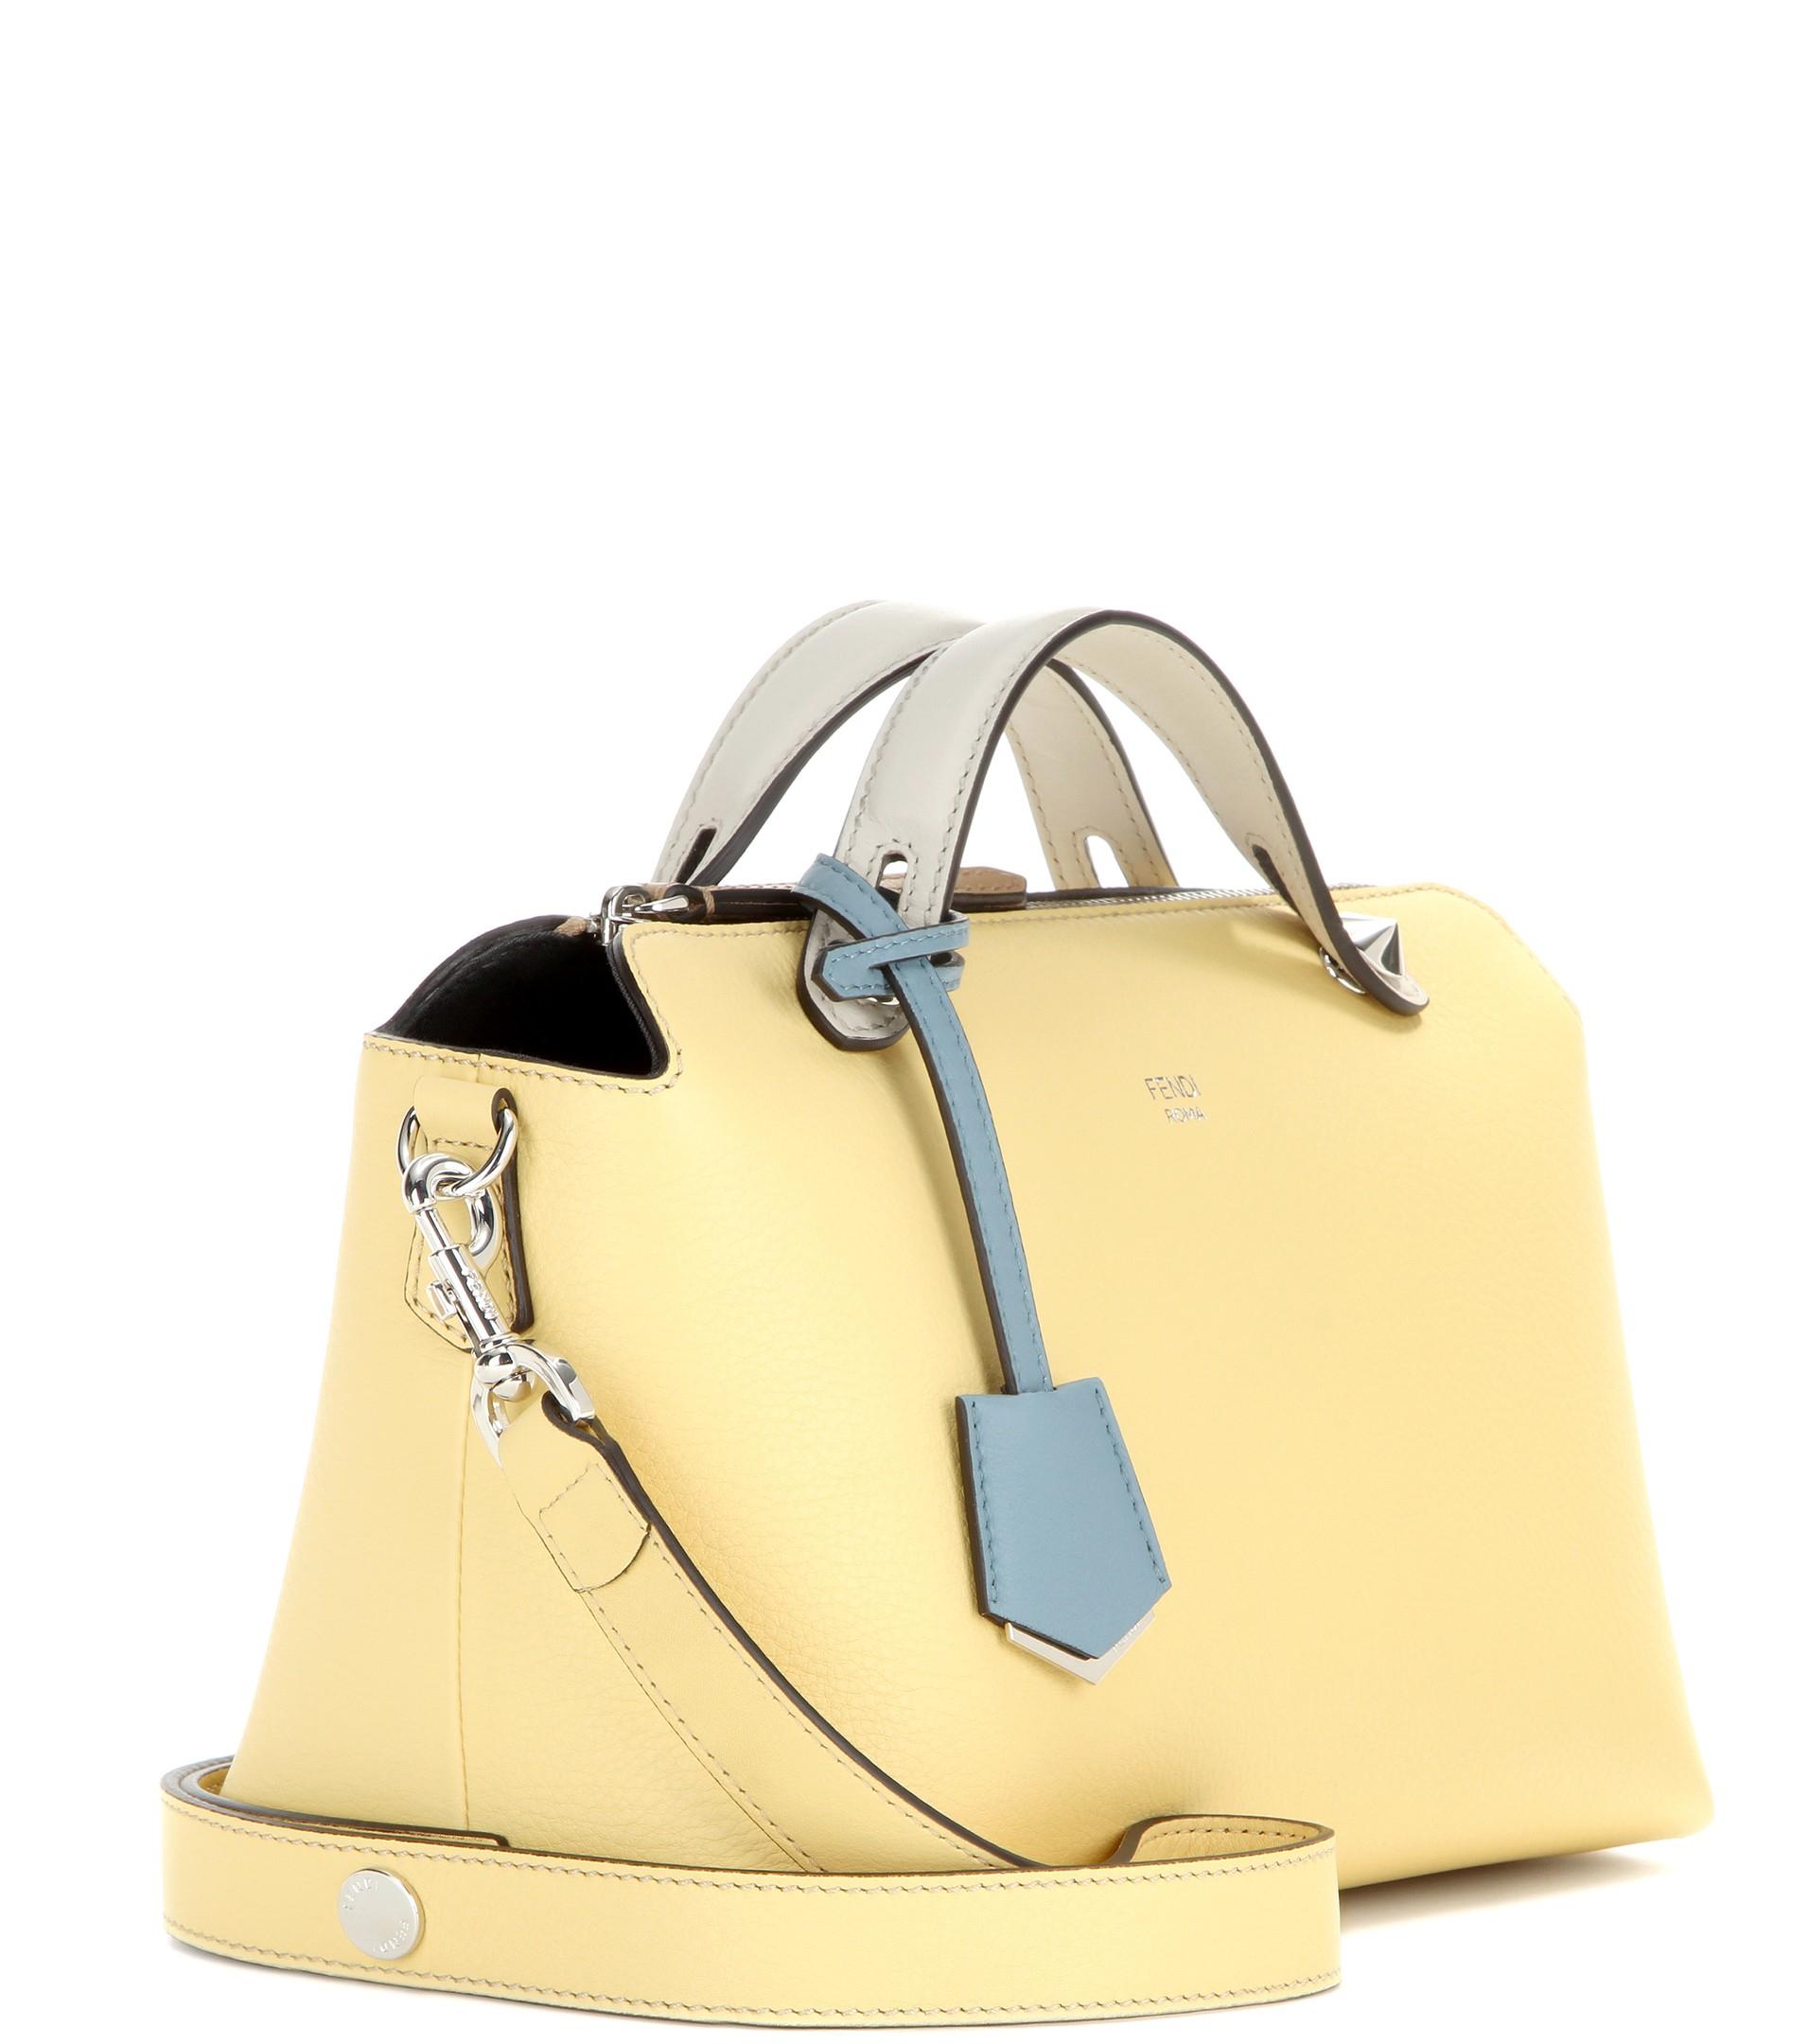 new zealand fendi bag small yellow fd16b e0e93 7bc7704962668